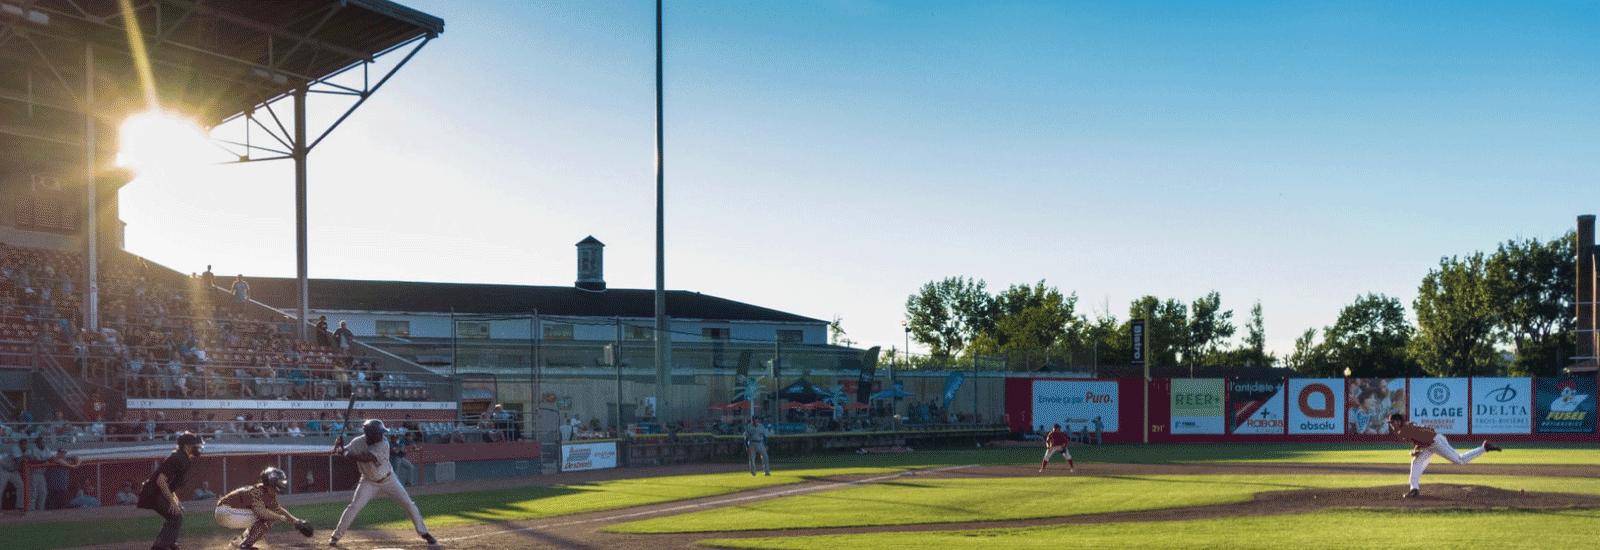 McCoy Stadium, Pawtucket, RI